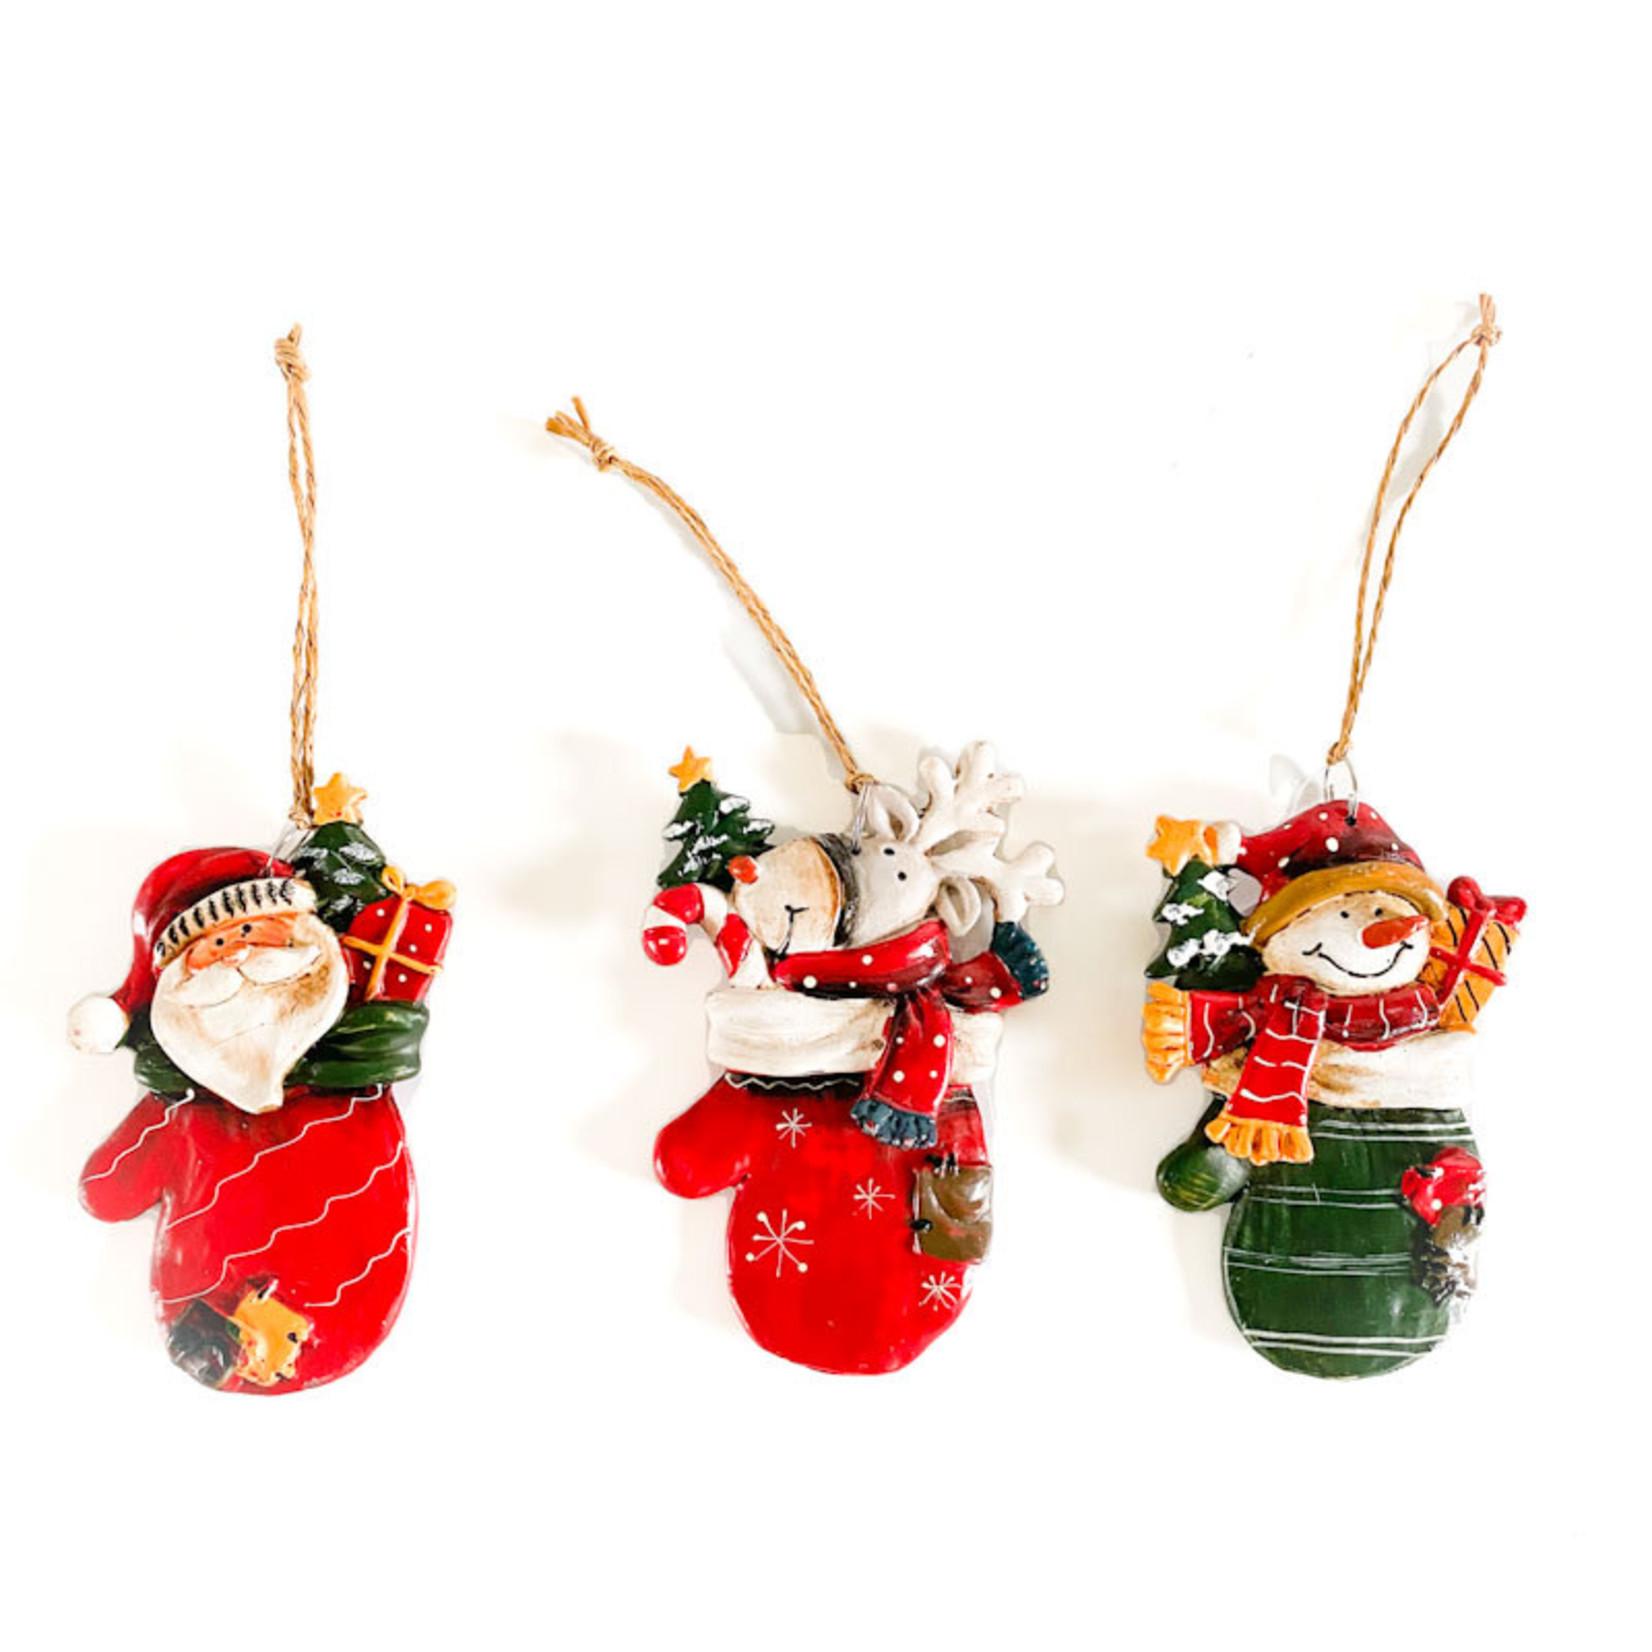 "Ornament - 3 1/2"" Santa, Snowman, Deer"